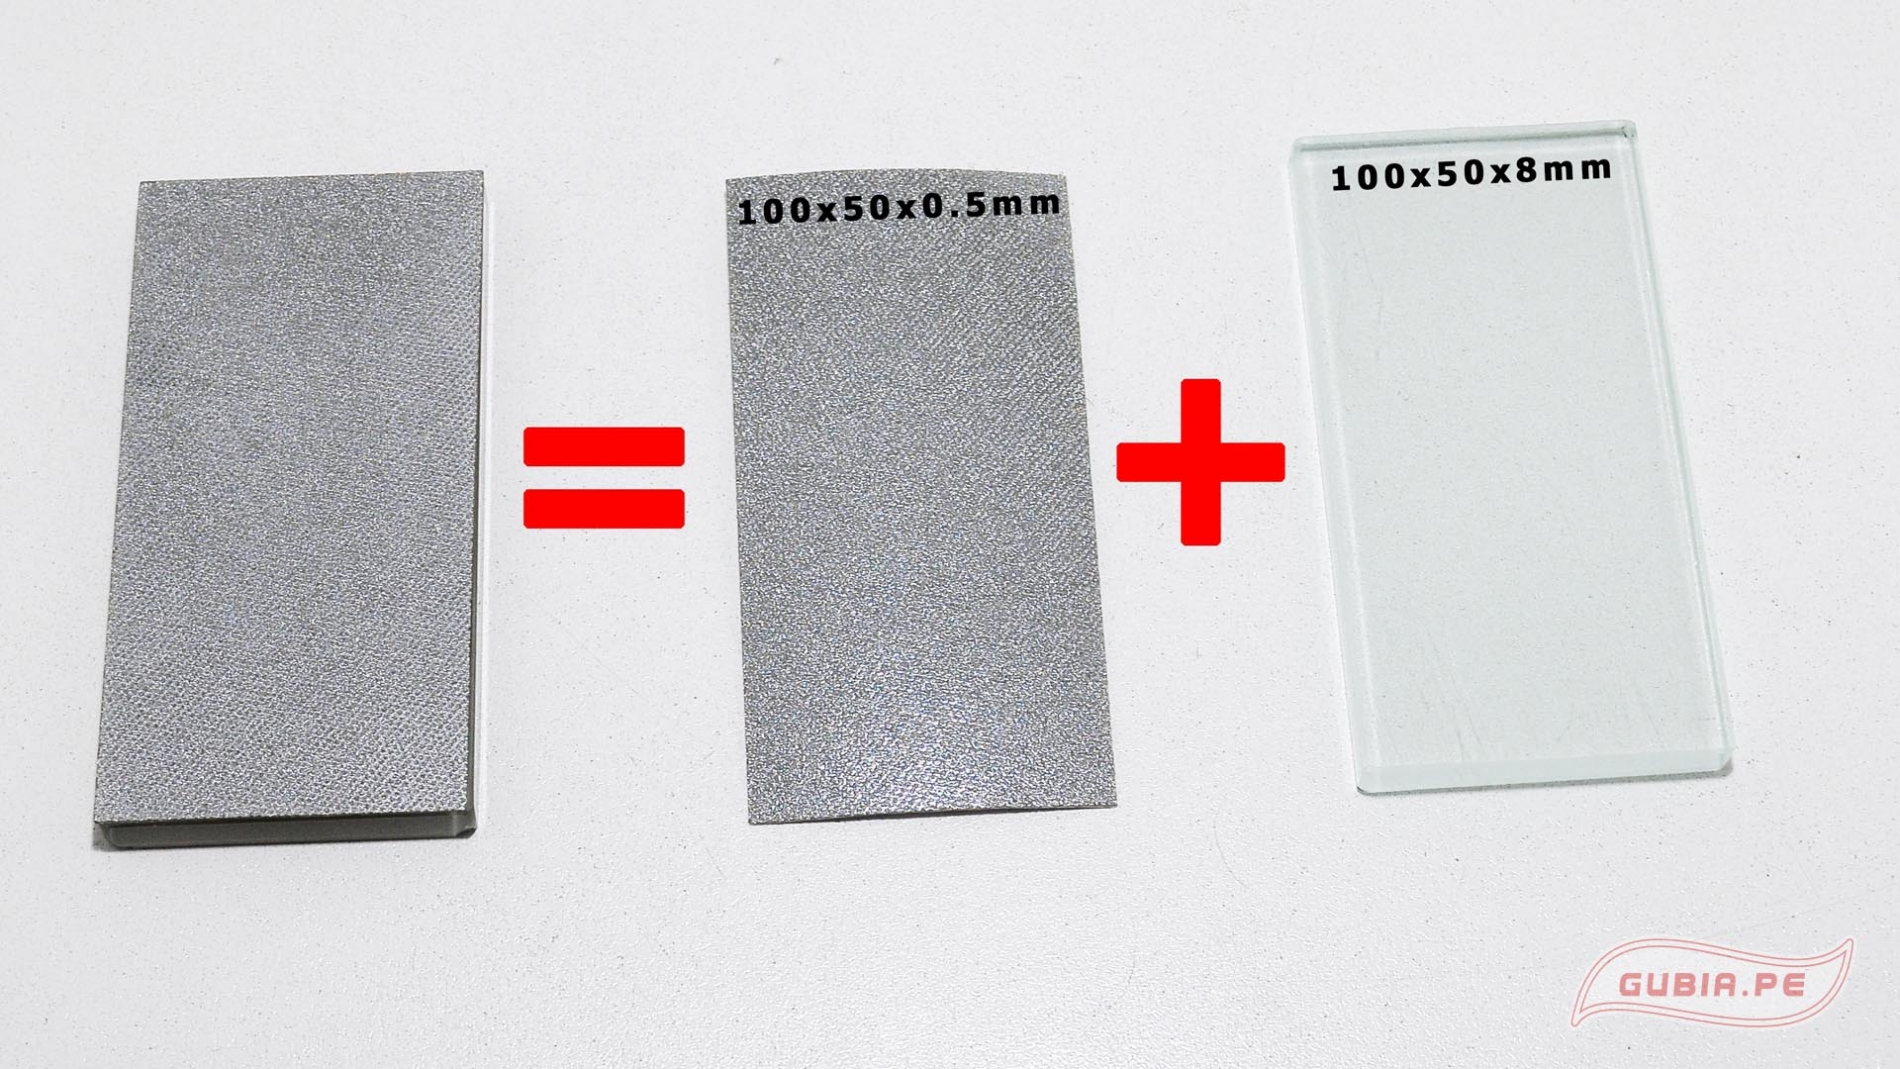 AtomaS140-Aplanador de piedras diamantado 100x50 grano 140 AtomaS140-max-2.